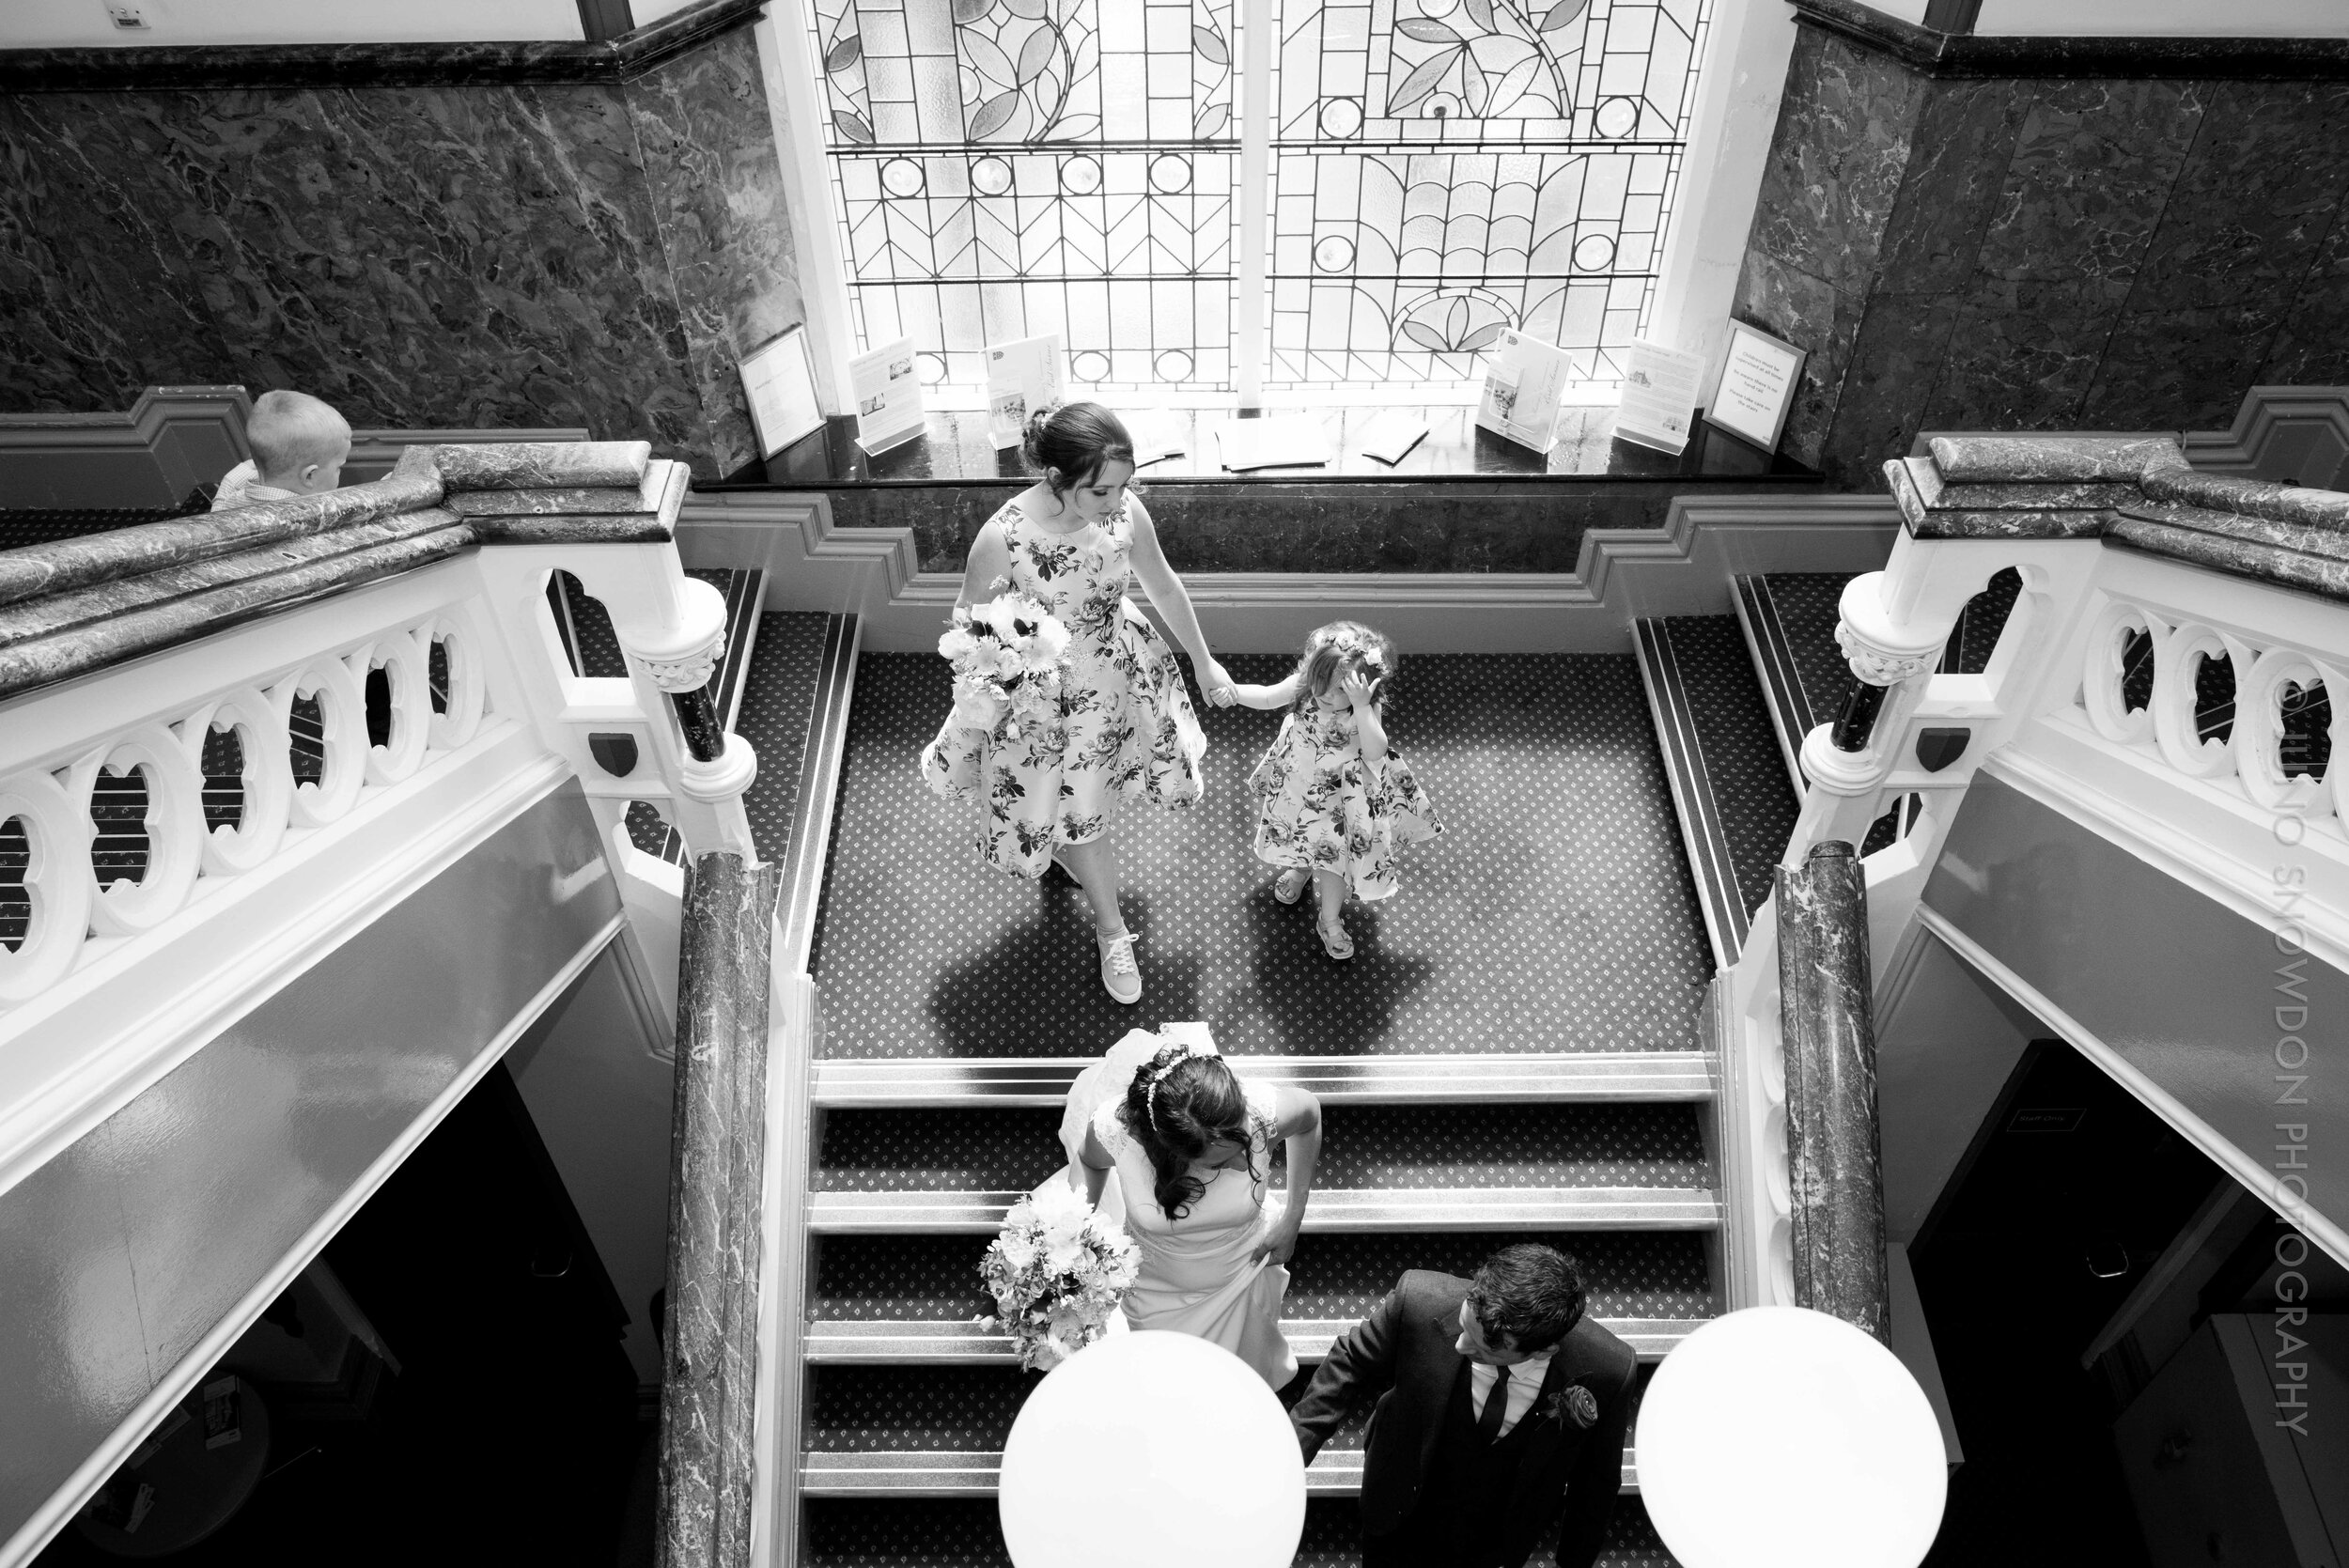 juno-snowdon-photography-wedding-7372.jpg